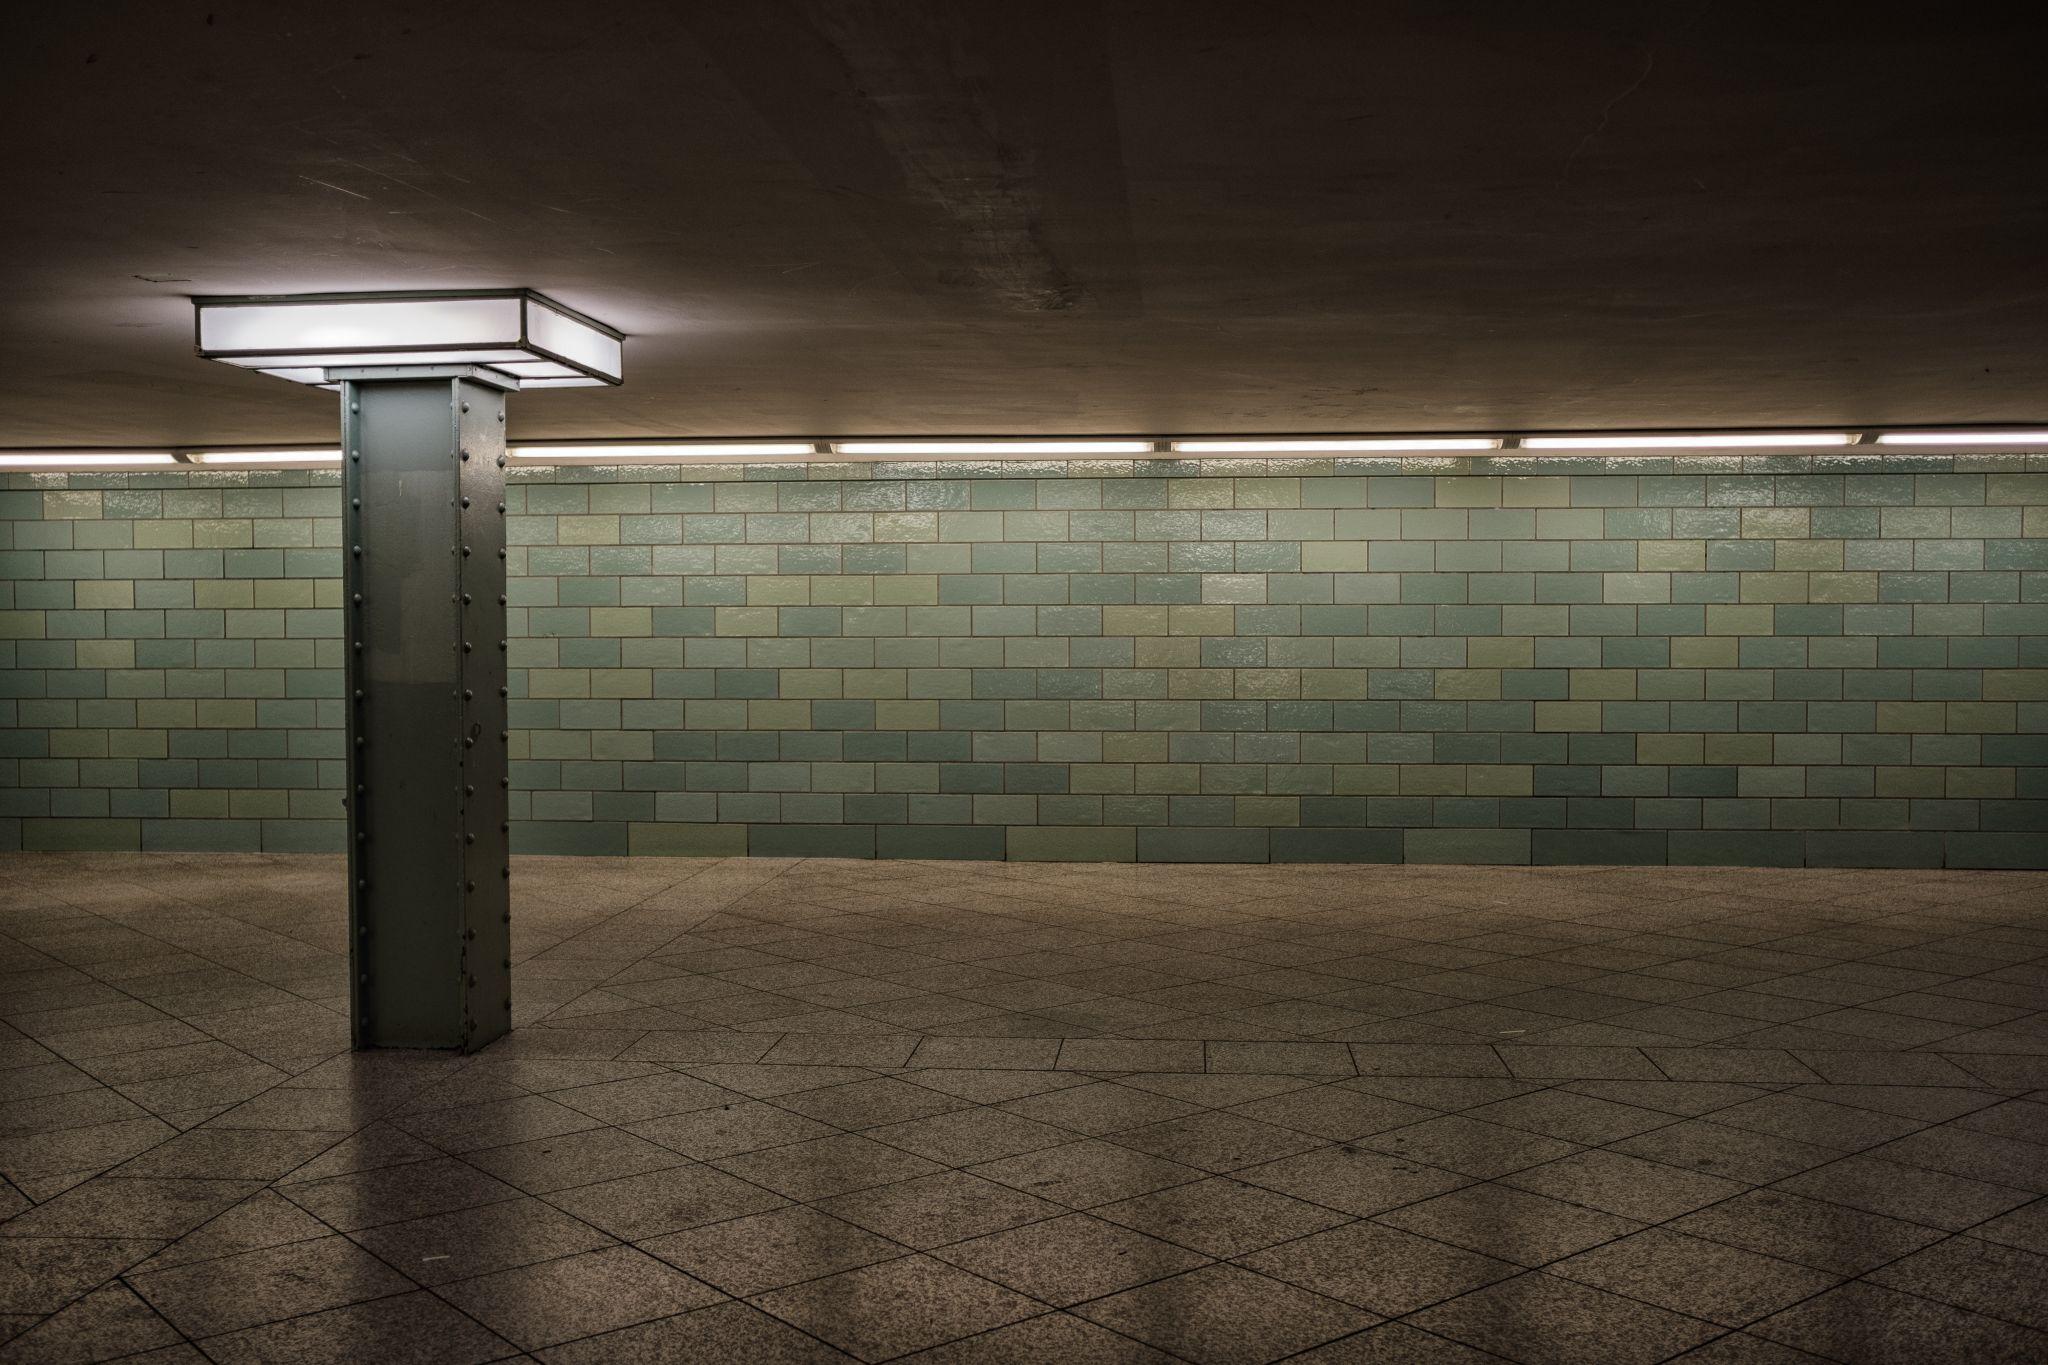 U Bahnhof Berlin Alexanderplatz, Germany